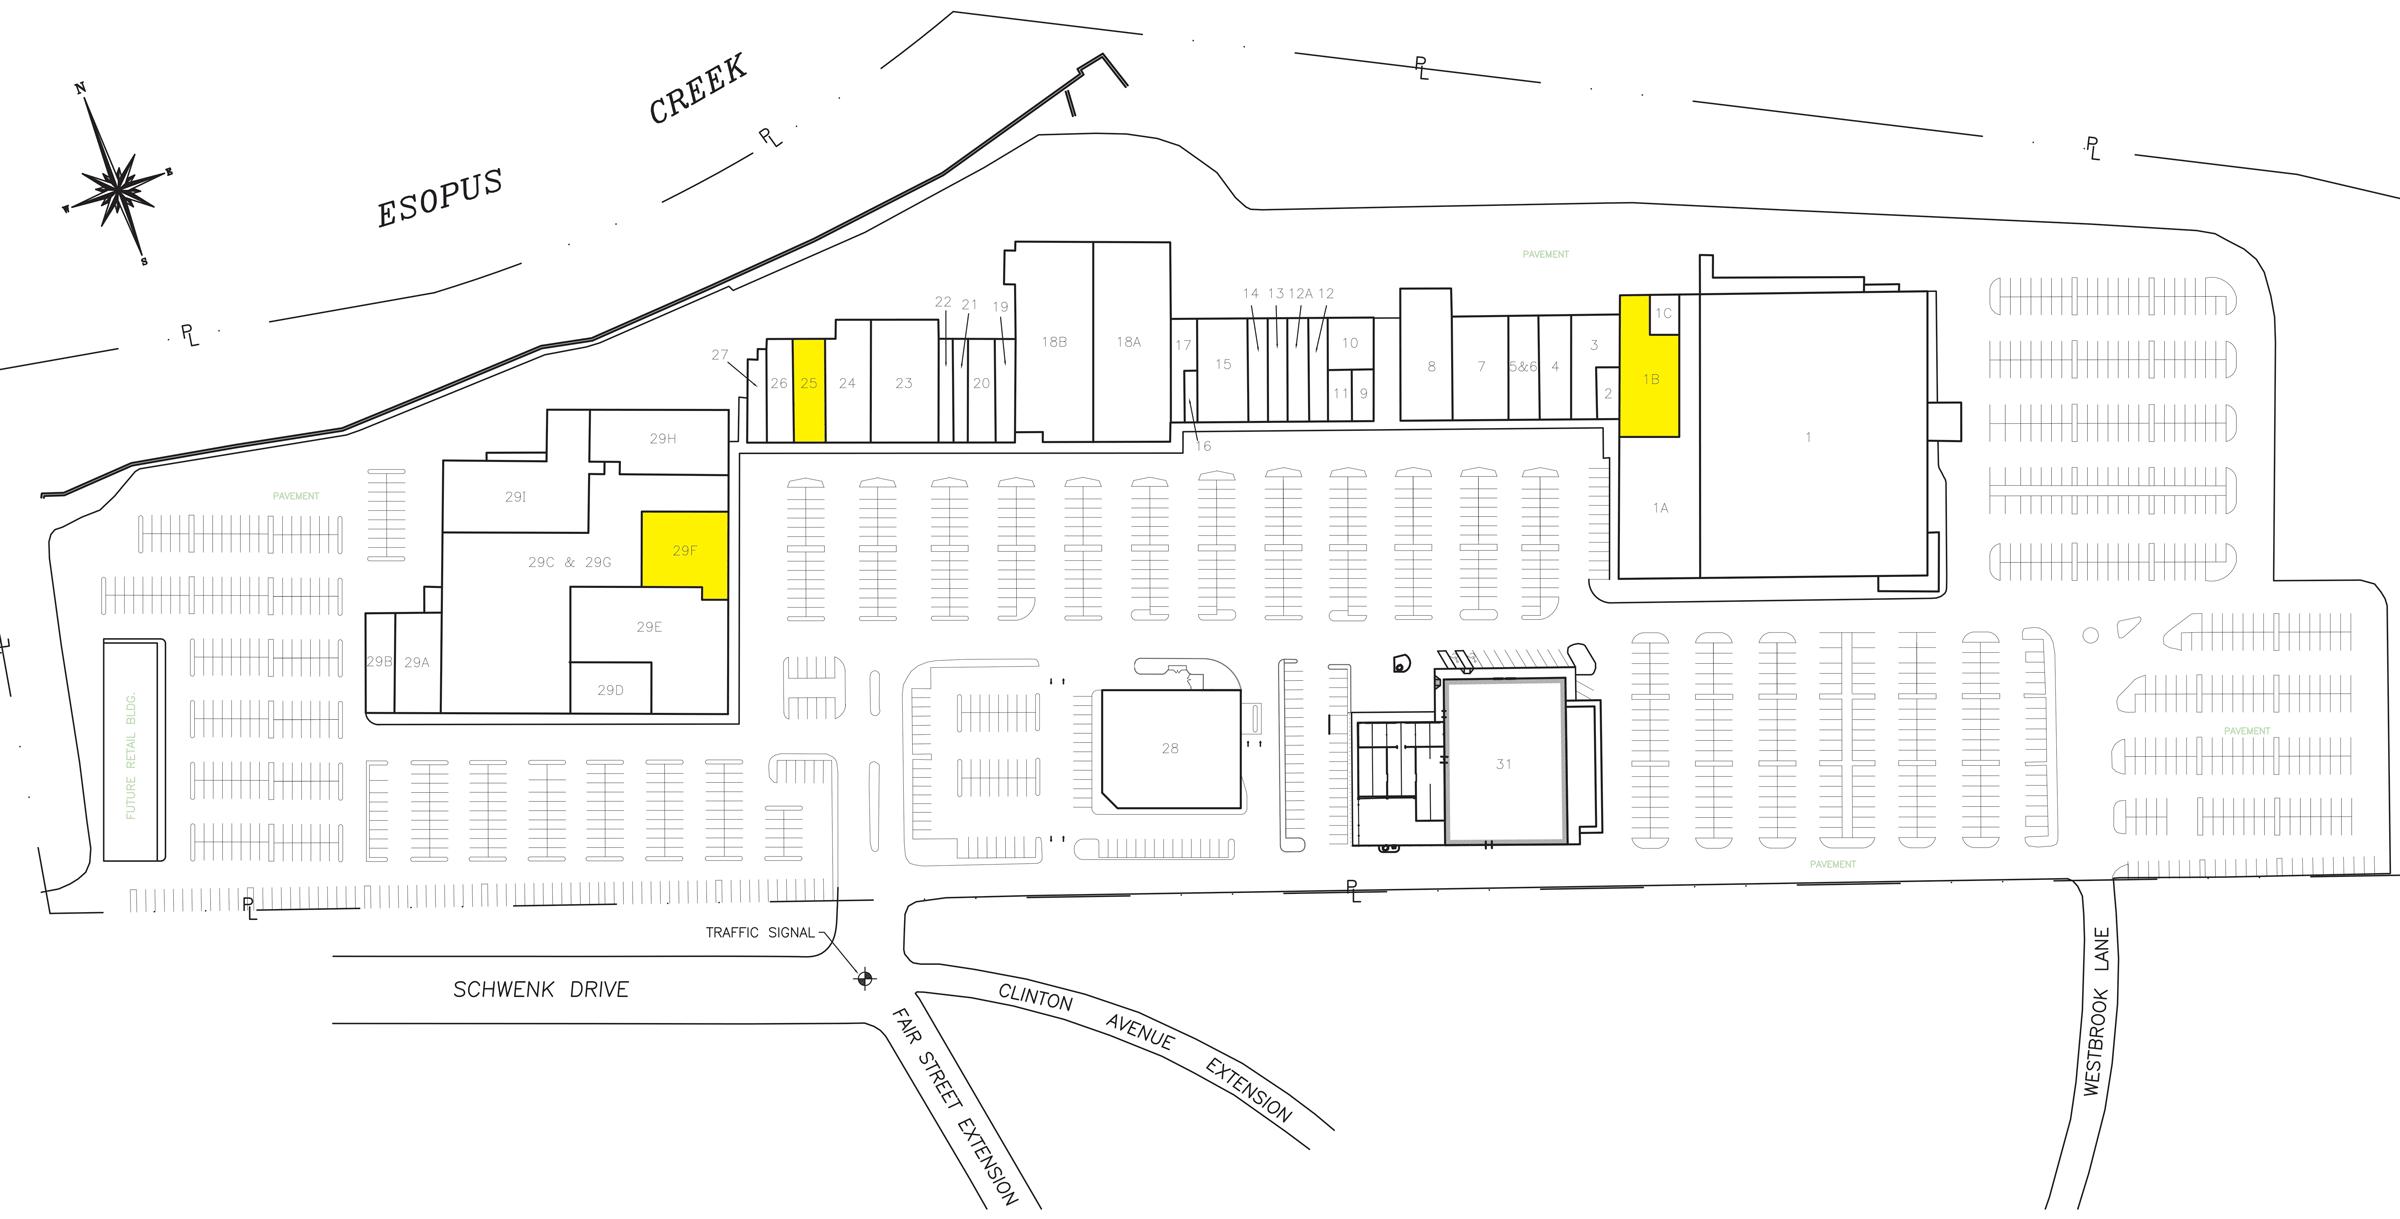 Kingston Plaza Map and Key